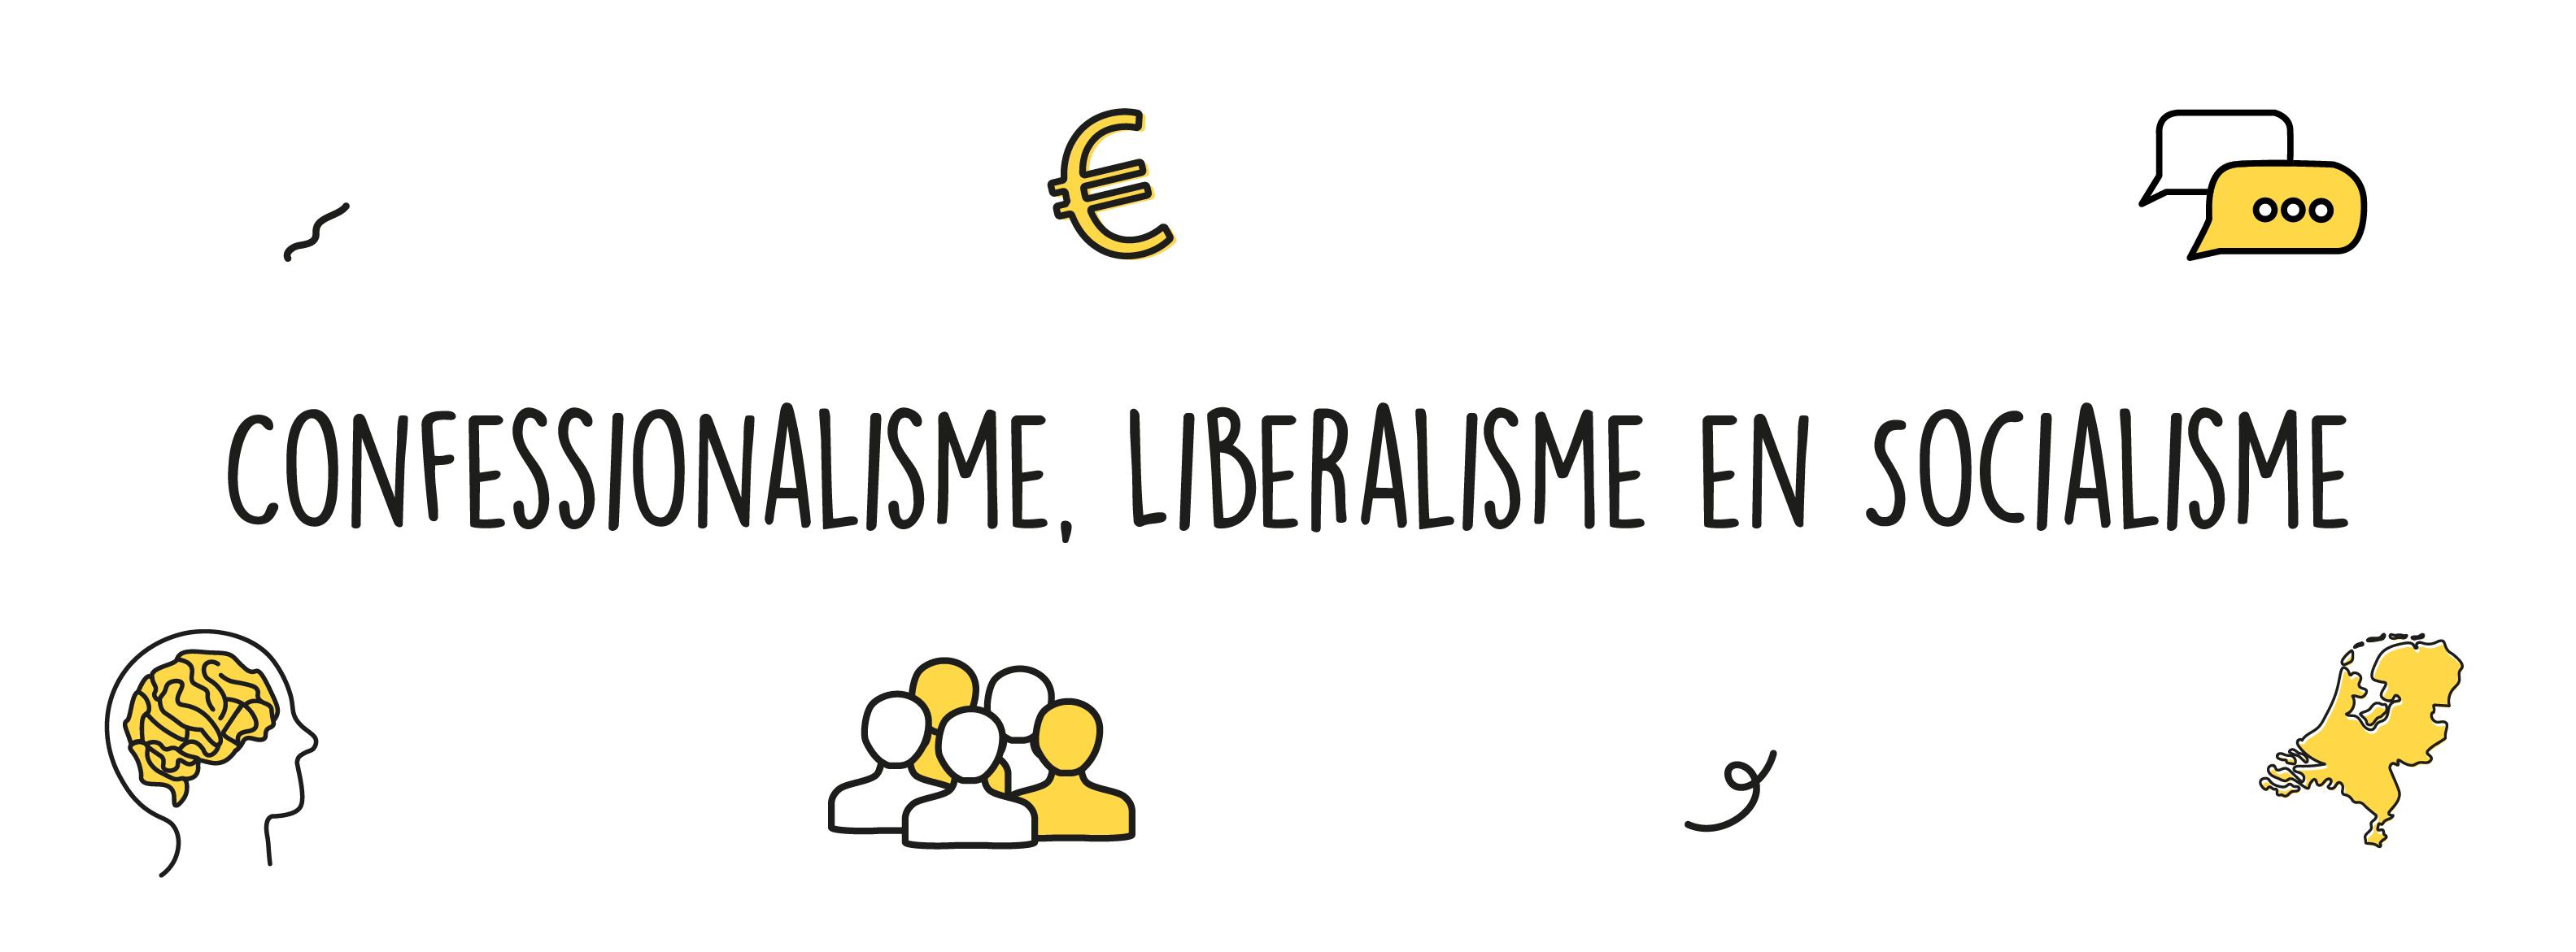 Confessionalisme, liberalisme en socialisme